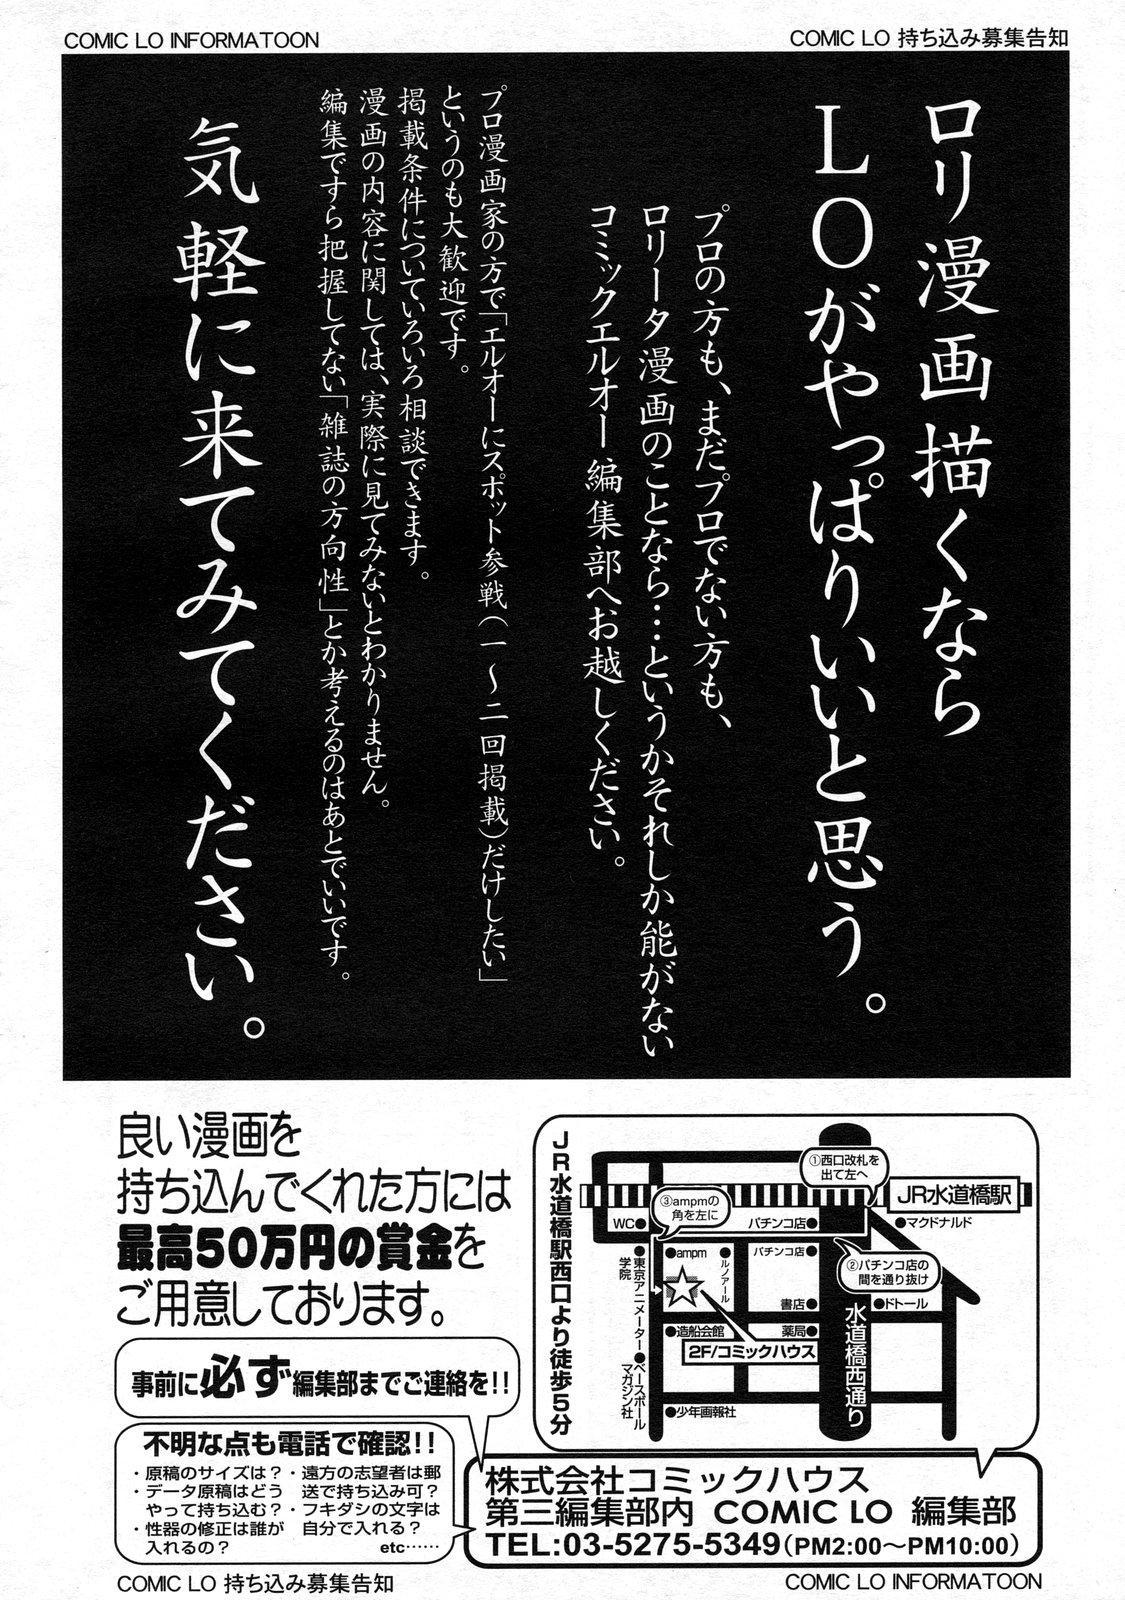 COMIC LO 2009-09 Vol. 66 198